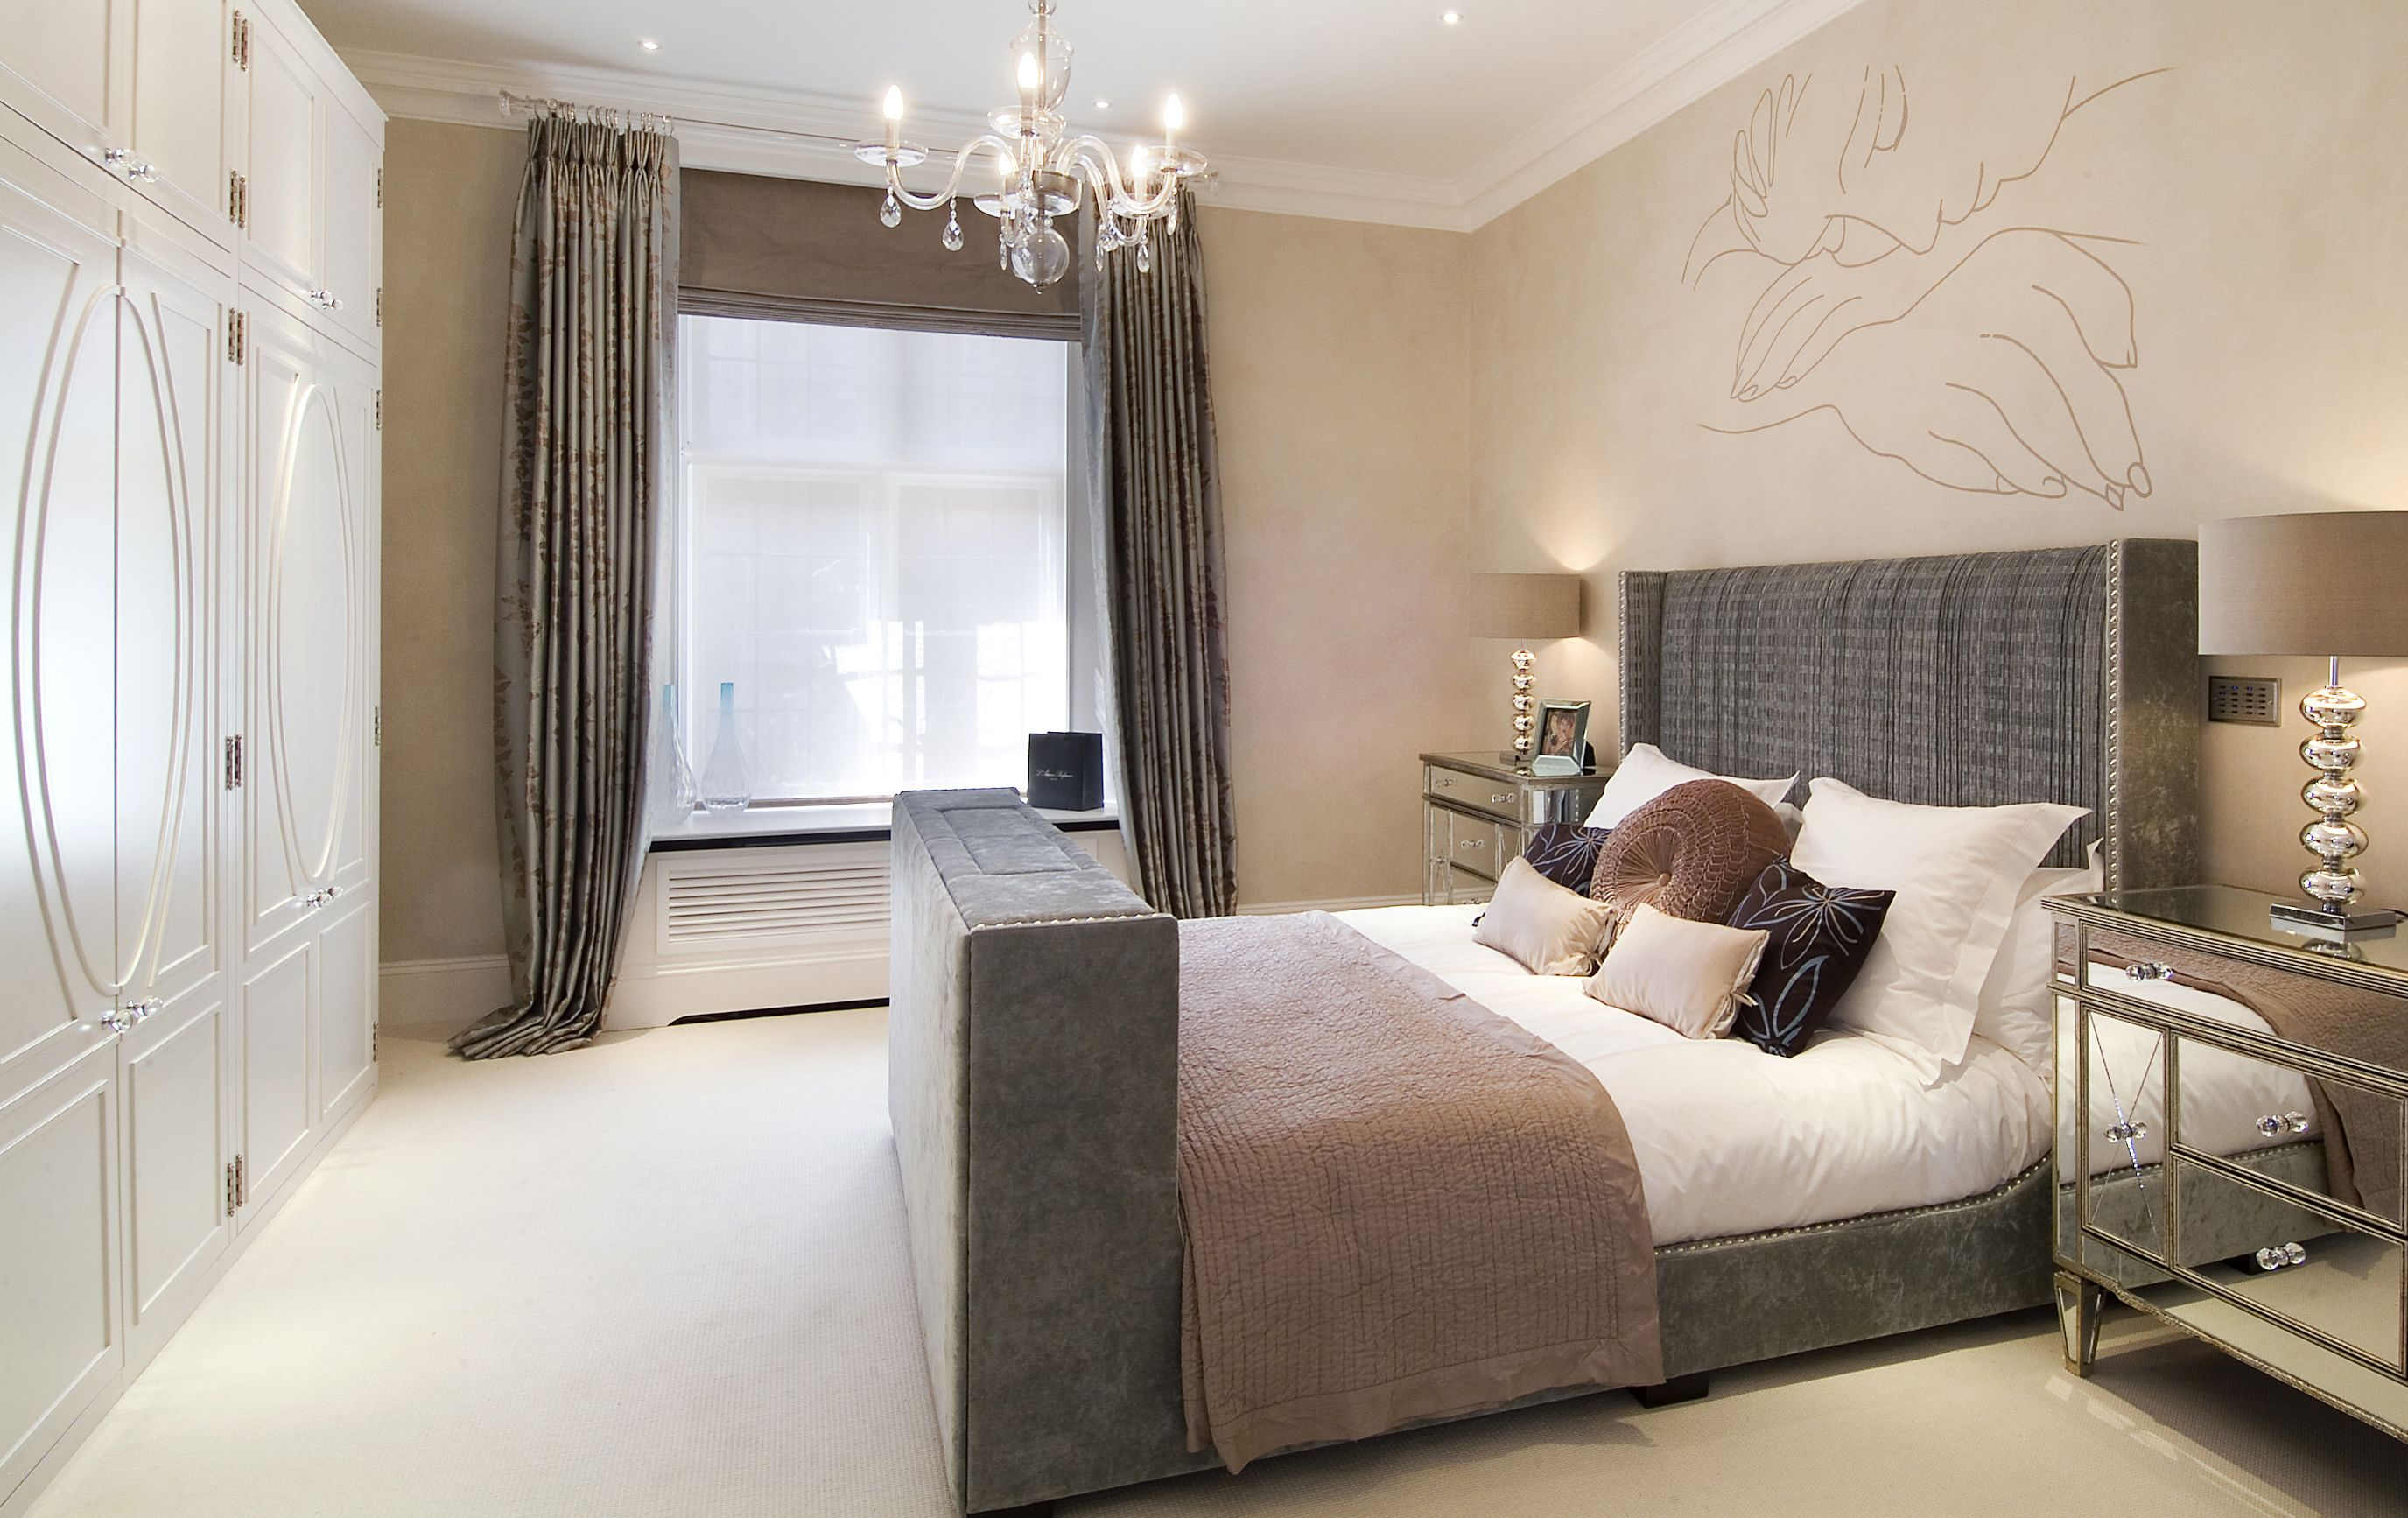 Glamorous Bedroom Furniture Uk Glamorous bedroom decorating ideas